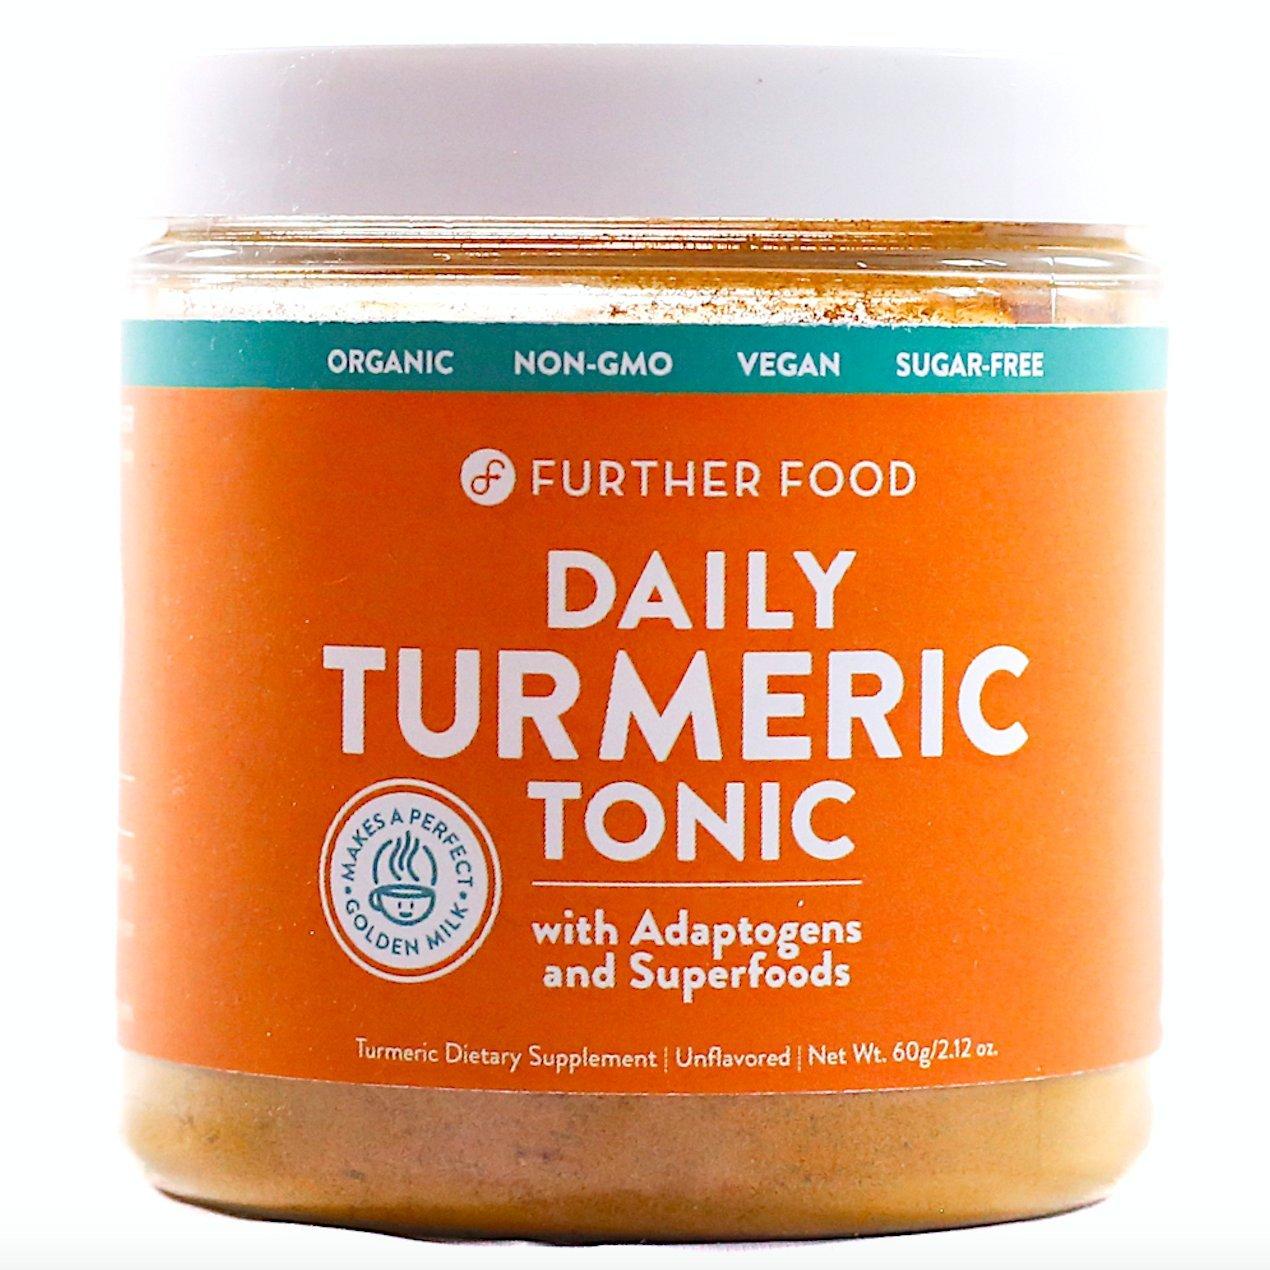 Daily Turmeric Tonic: ORGANIC Turmeric + 7 Superfood & Adaptogen Antioxidant Golden Milk Blend; Makes a Perfect Turmeric Tea & Latte, Sugar-Free, non-GMO, Vegan (2.12 oz.)